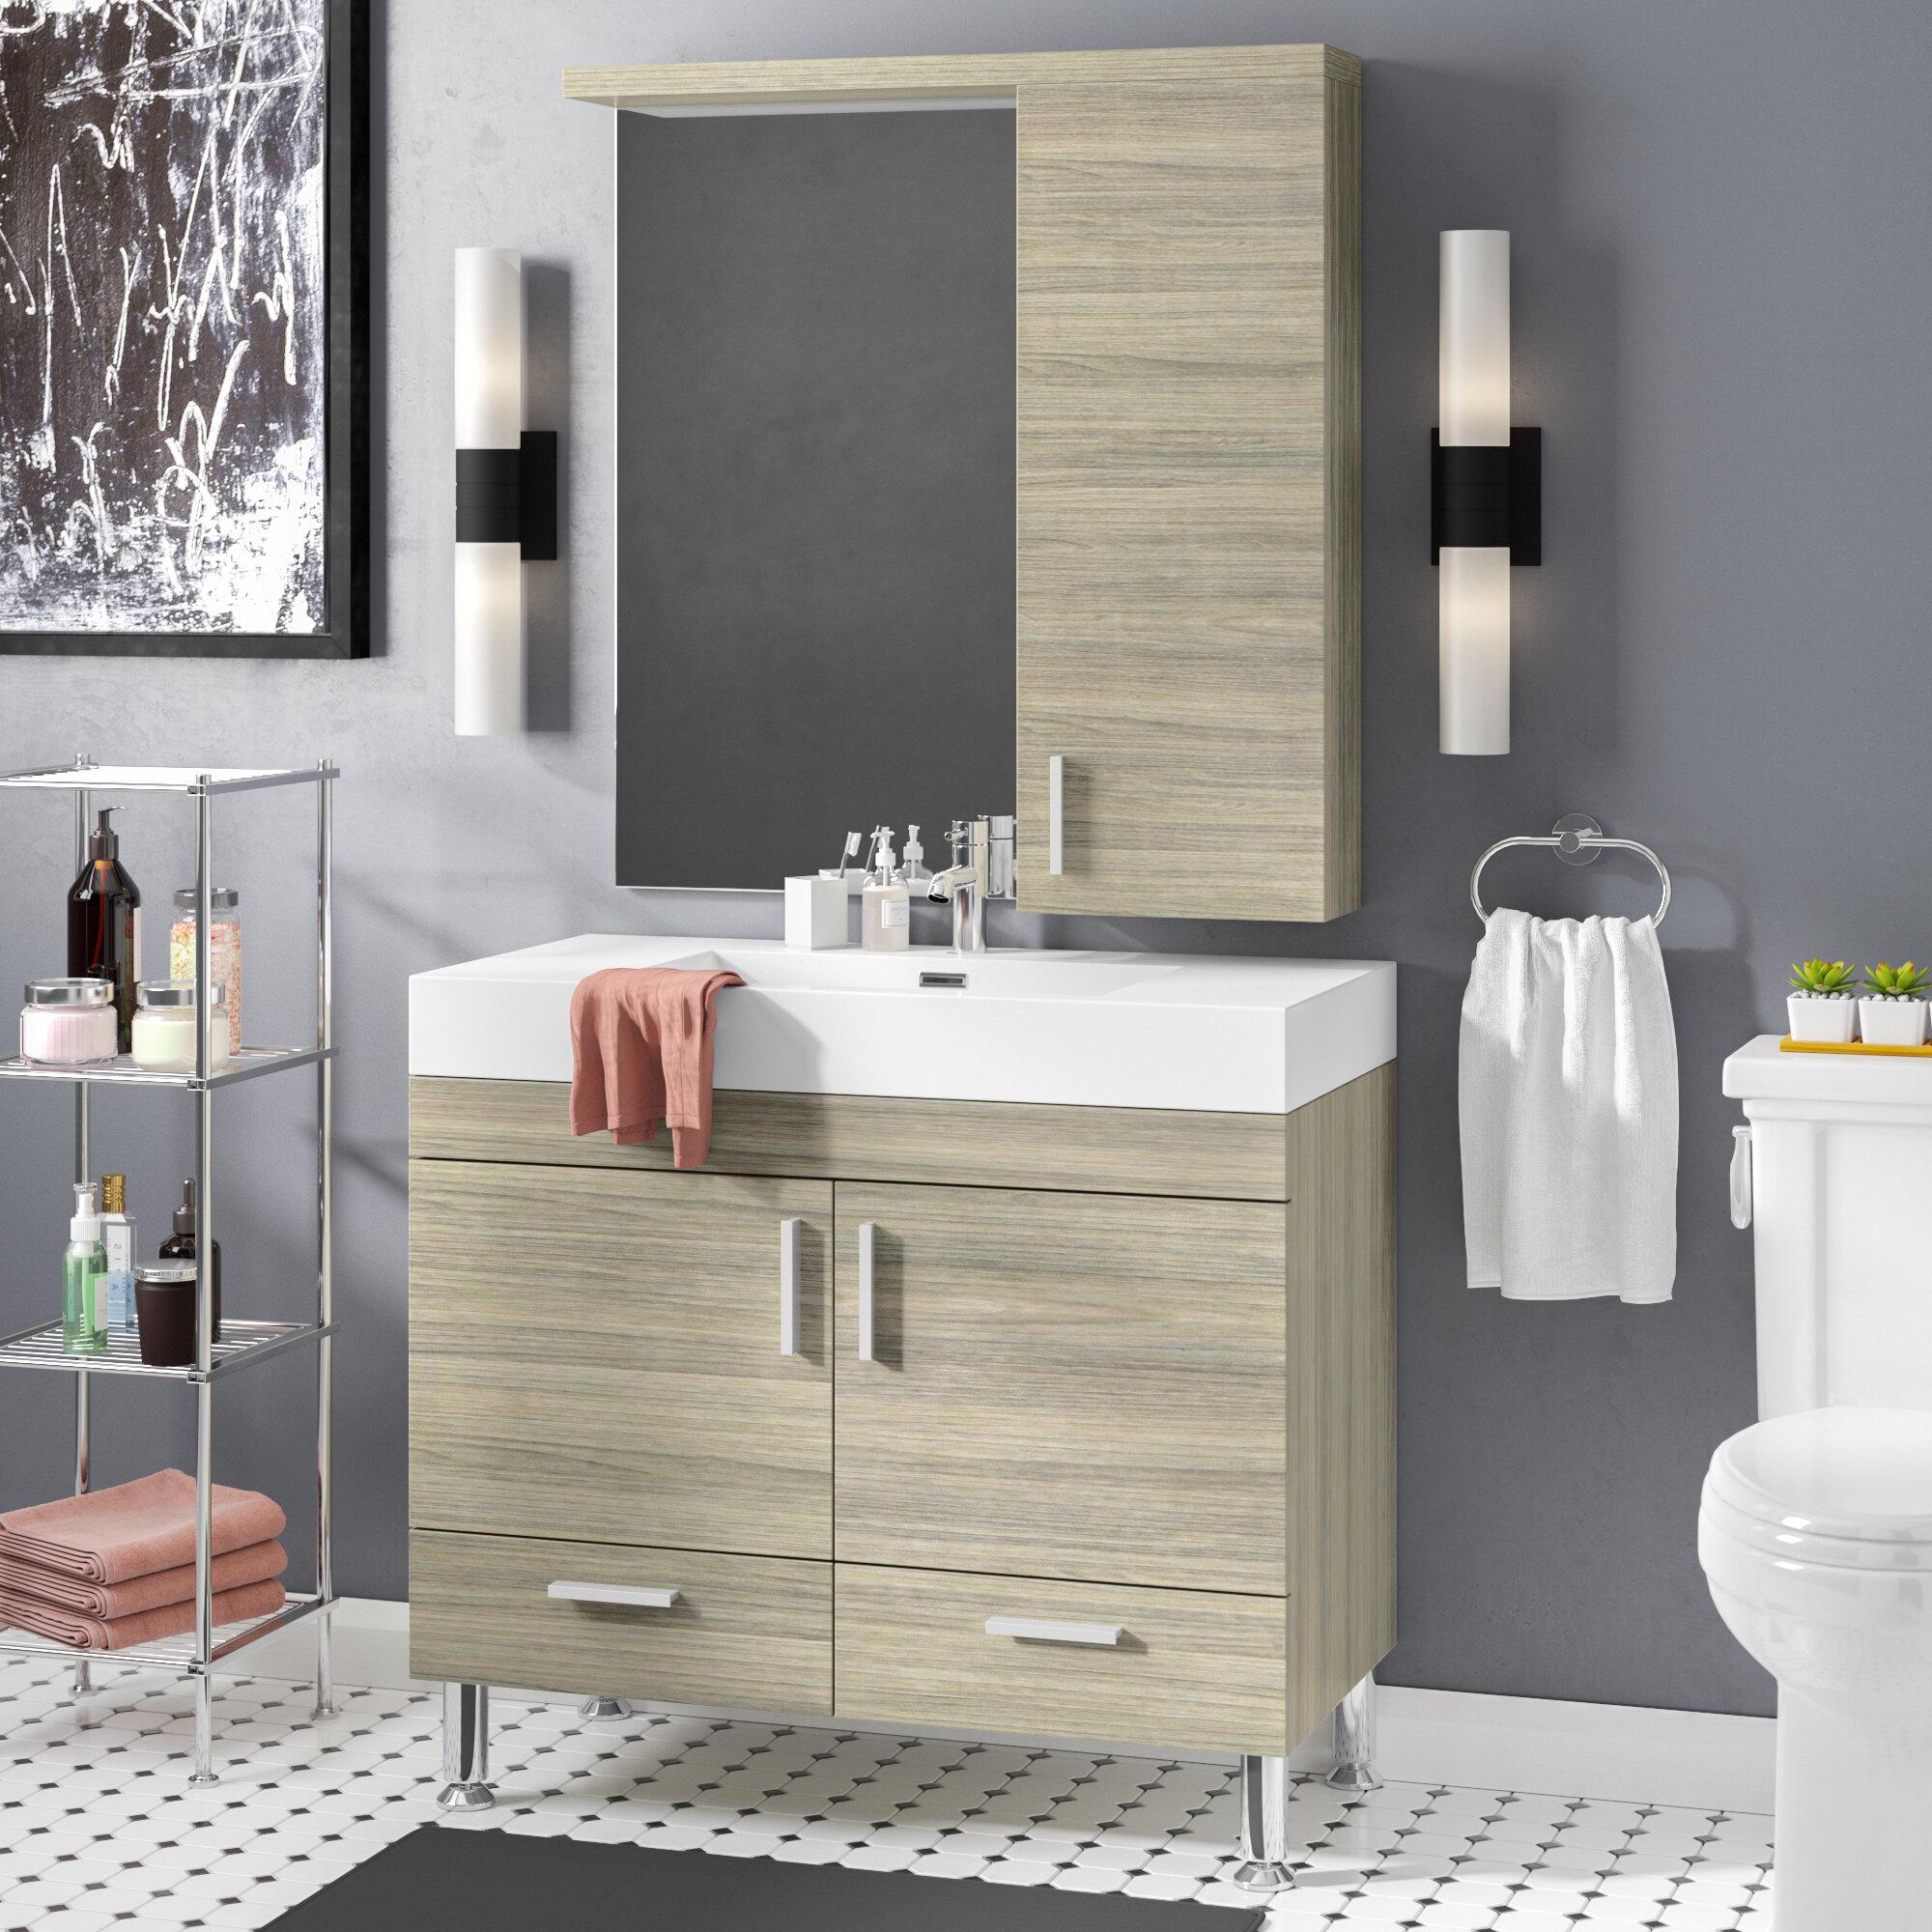 Magnificent Waldwick 36 Single Modern Bathroom Vanity Set With Mirror Download Free Architecture Designs Grimeyleaguecom